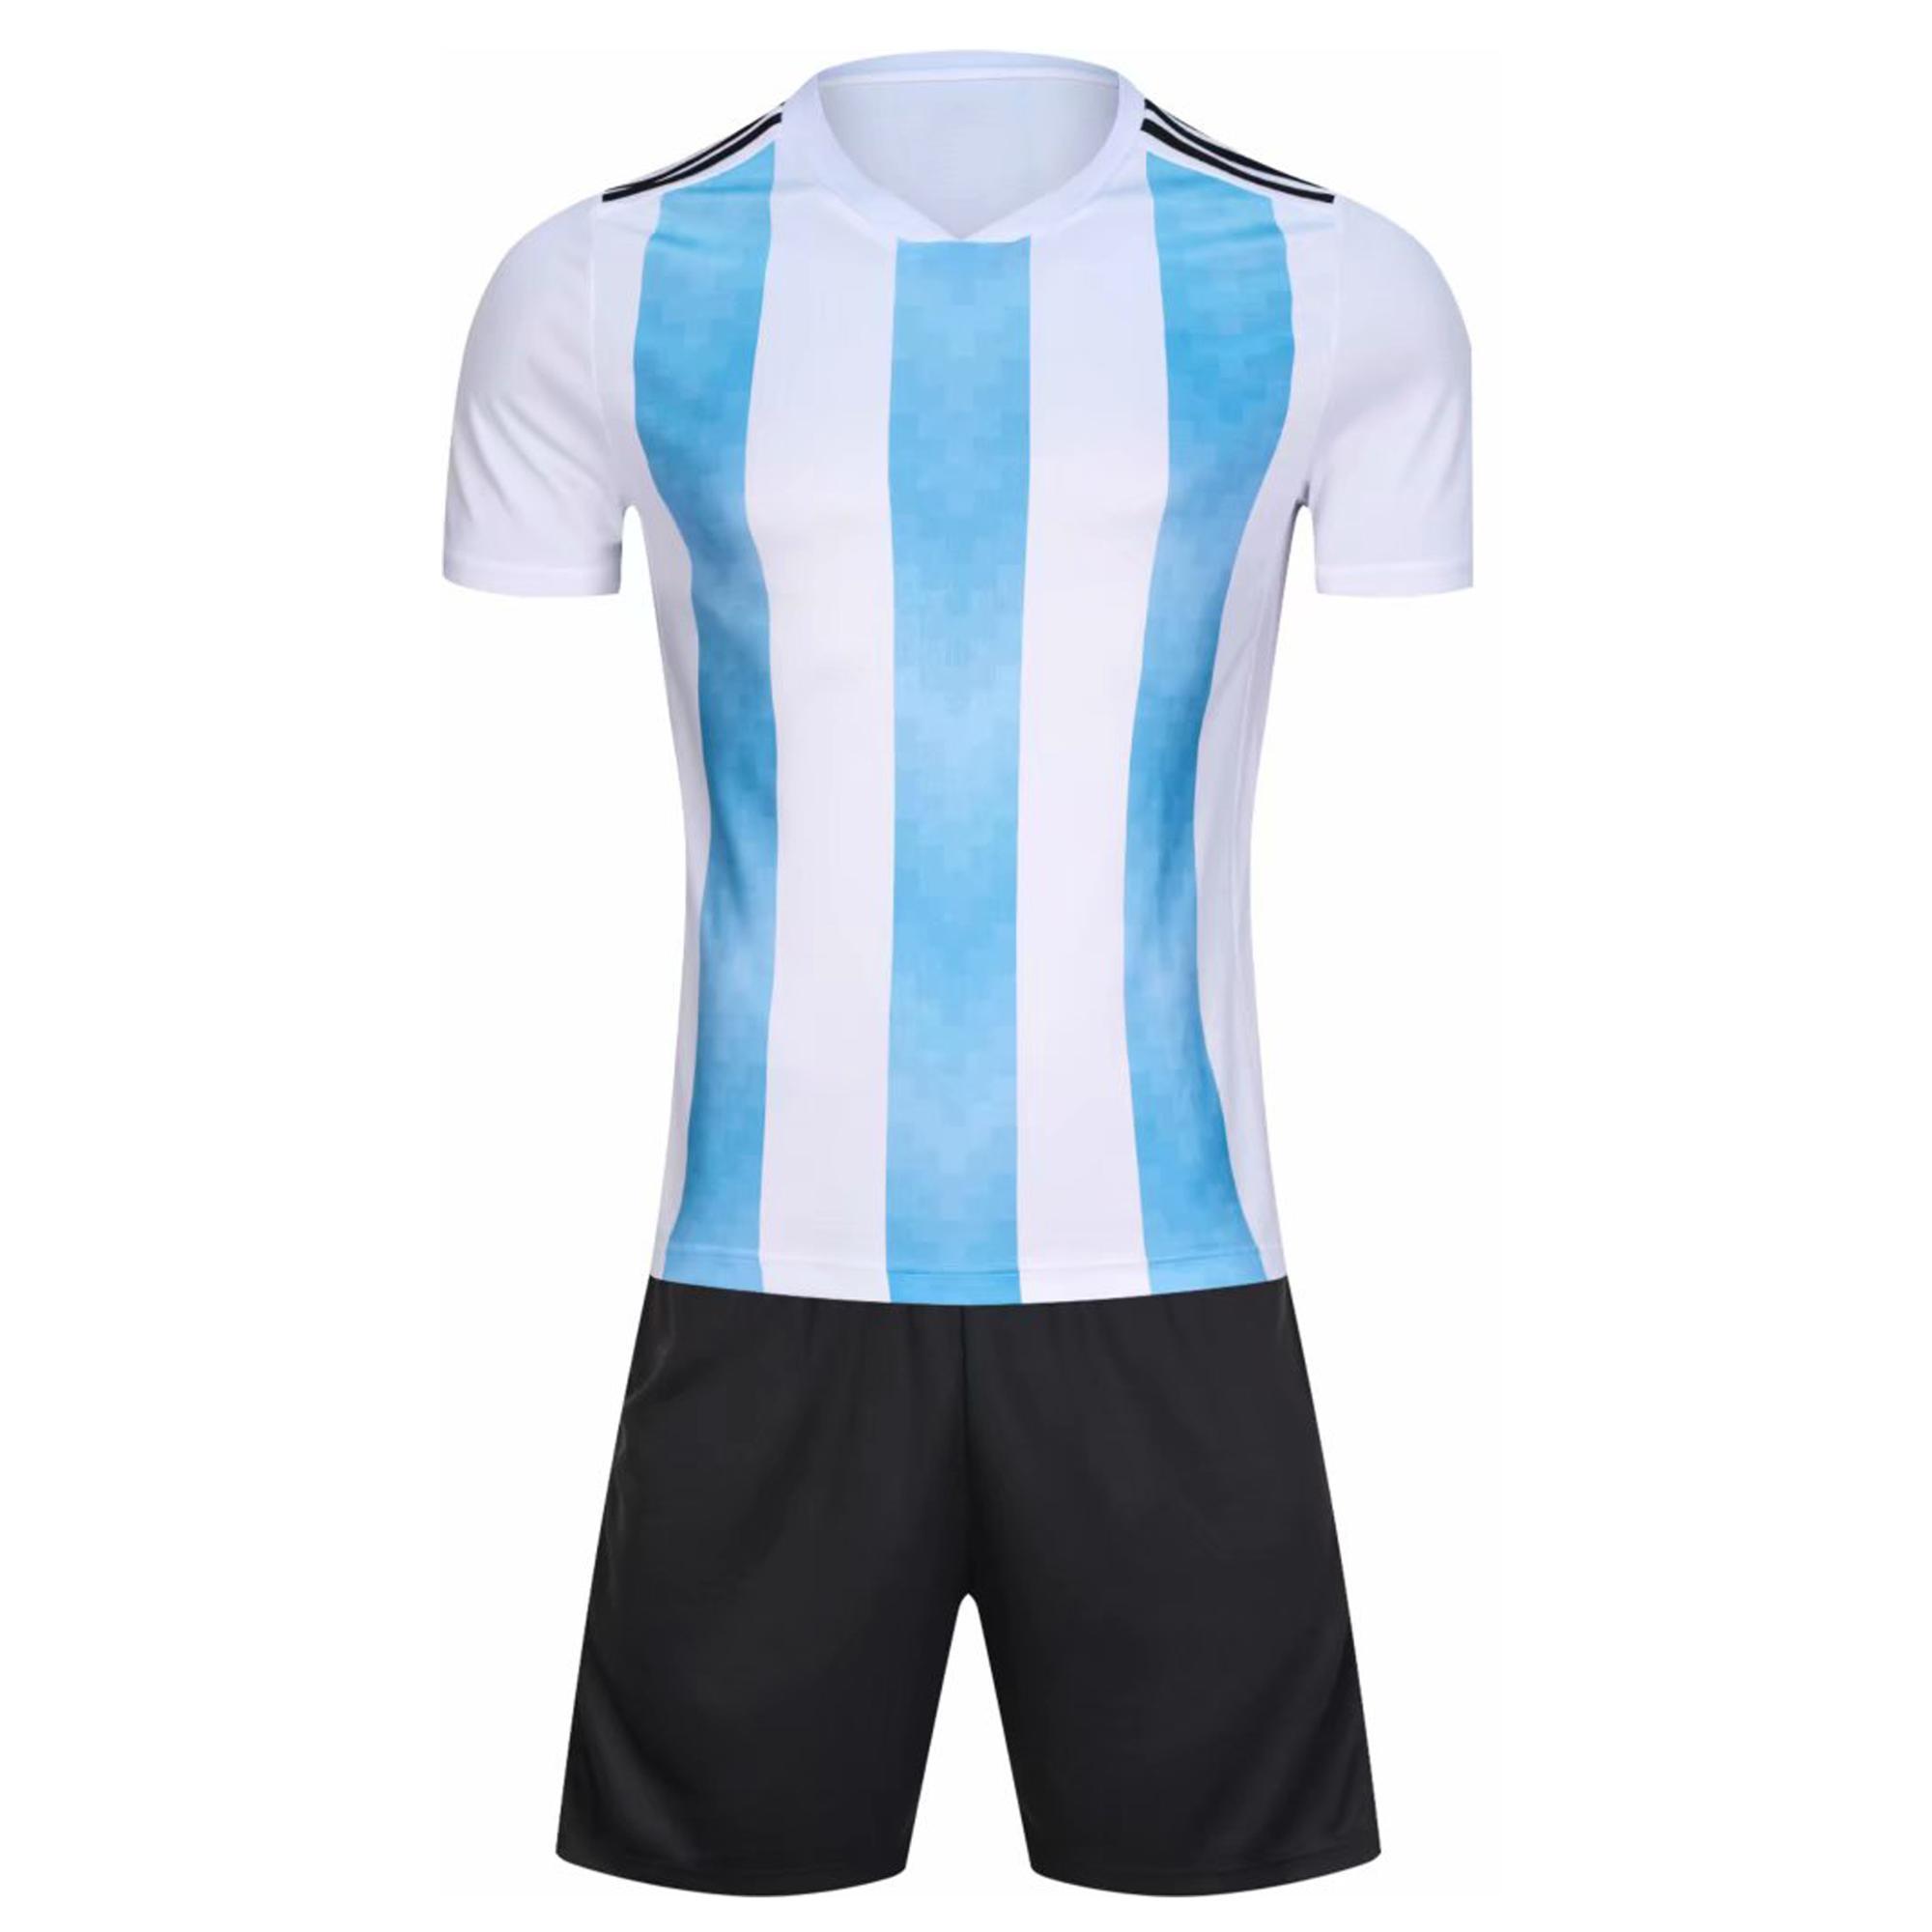 9f26c80fef9 thai quality custom soccer uniform team jersey soccer jersey European football  shirts